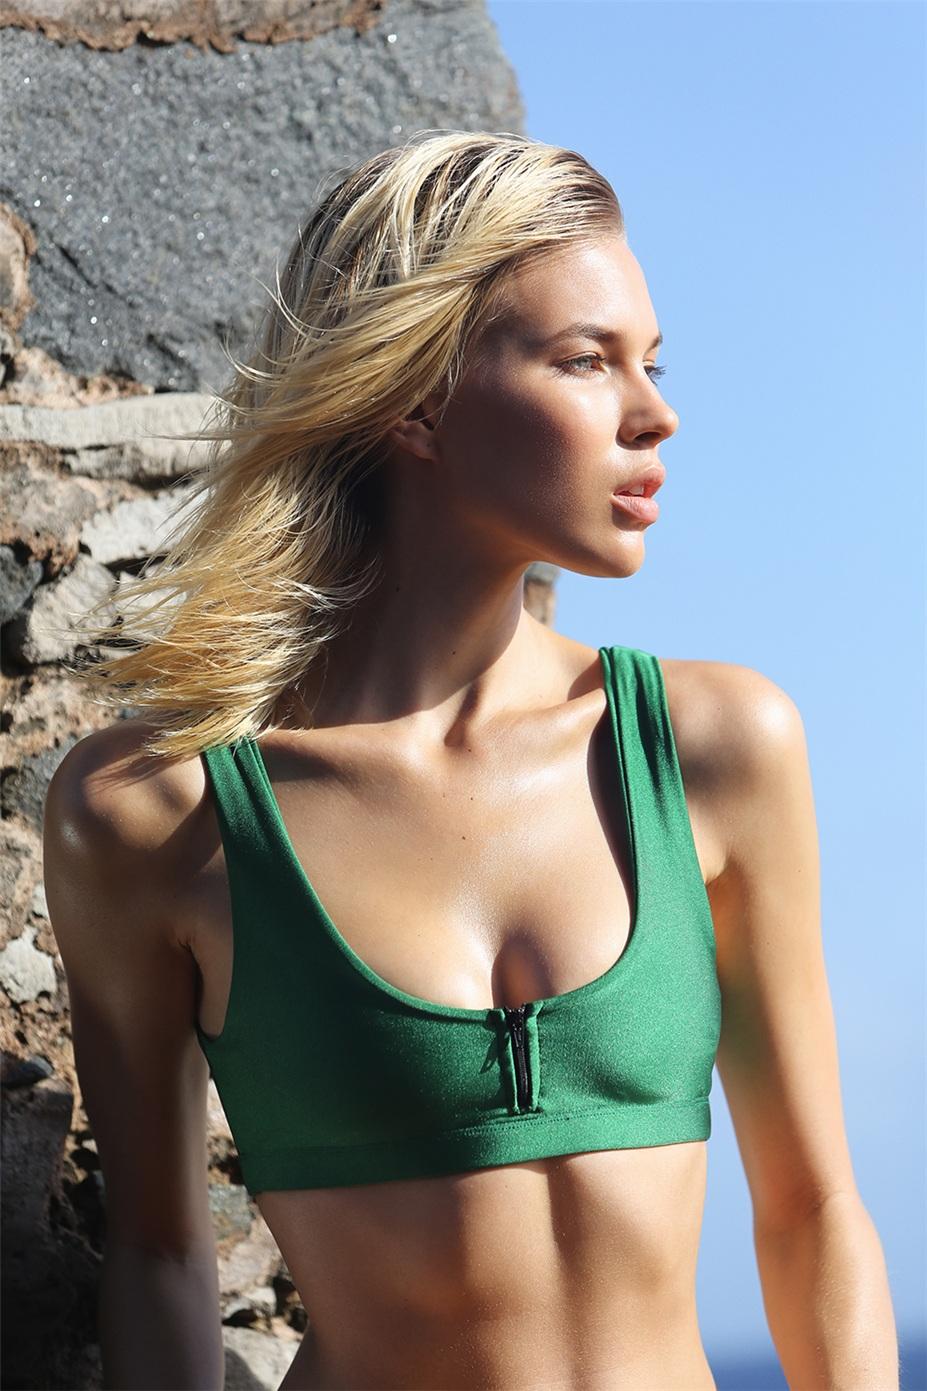 Amanda Nørgaard photos